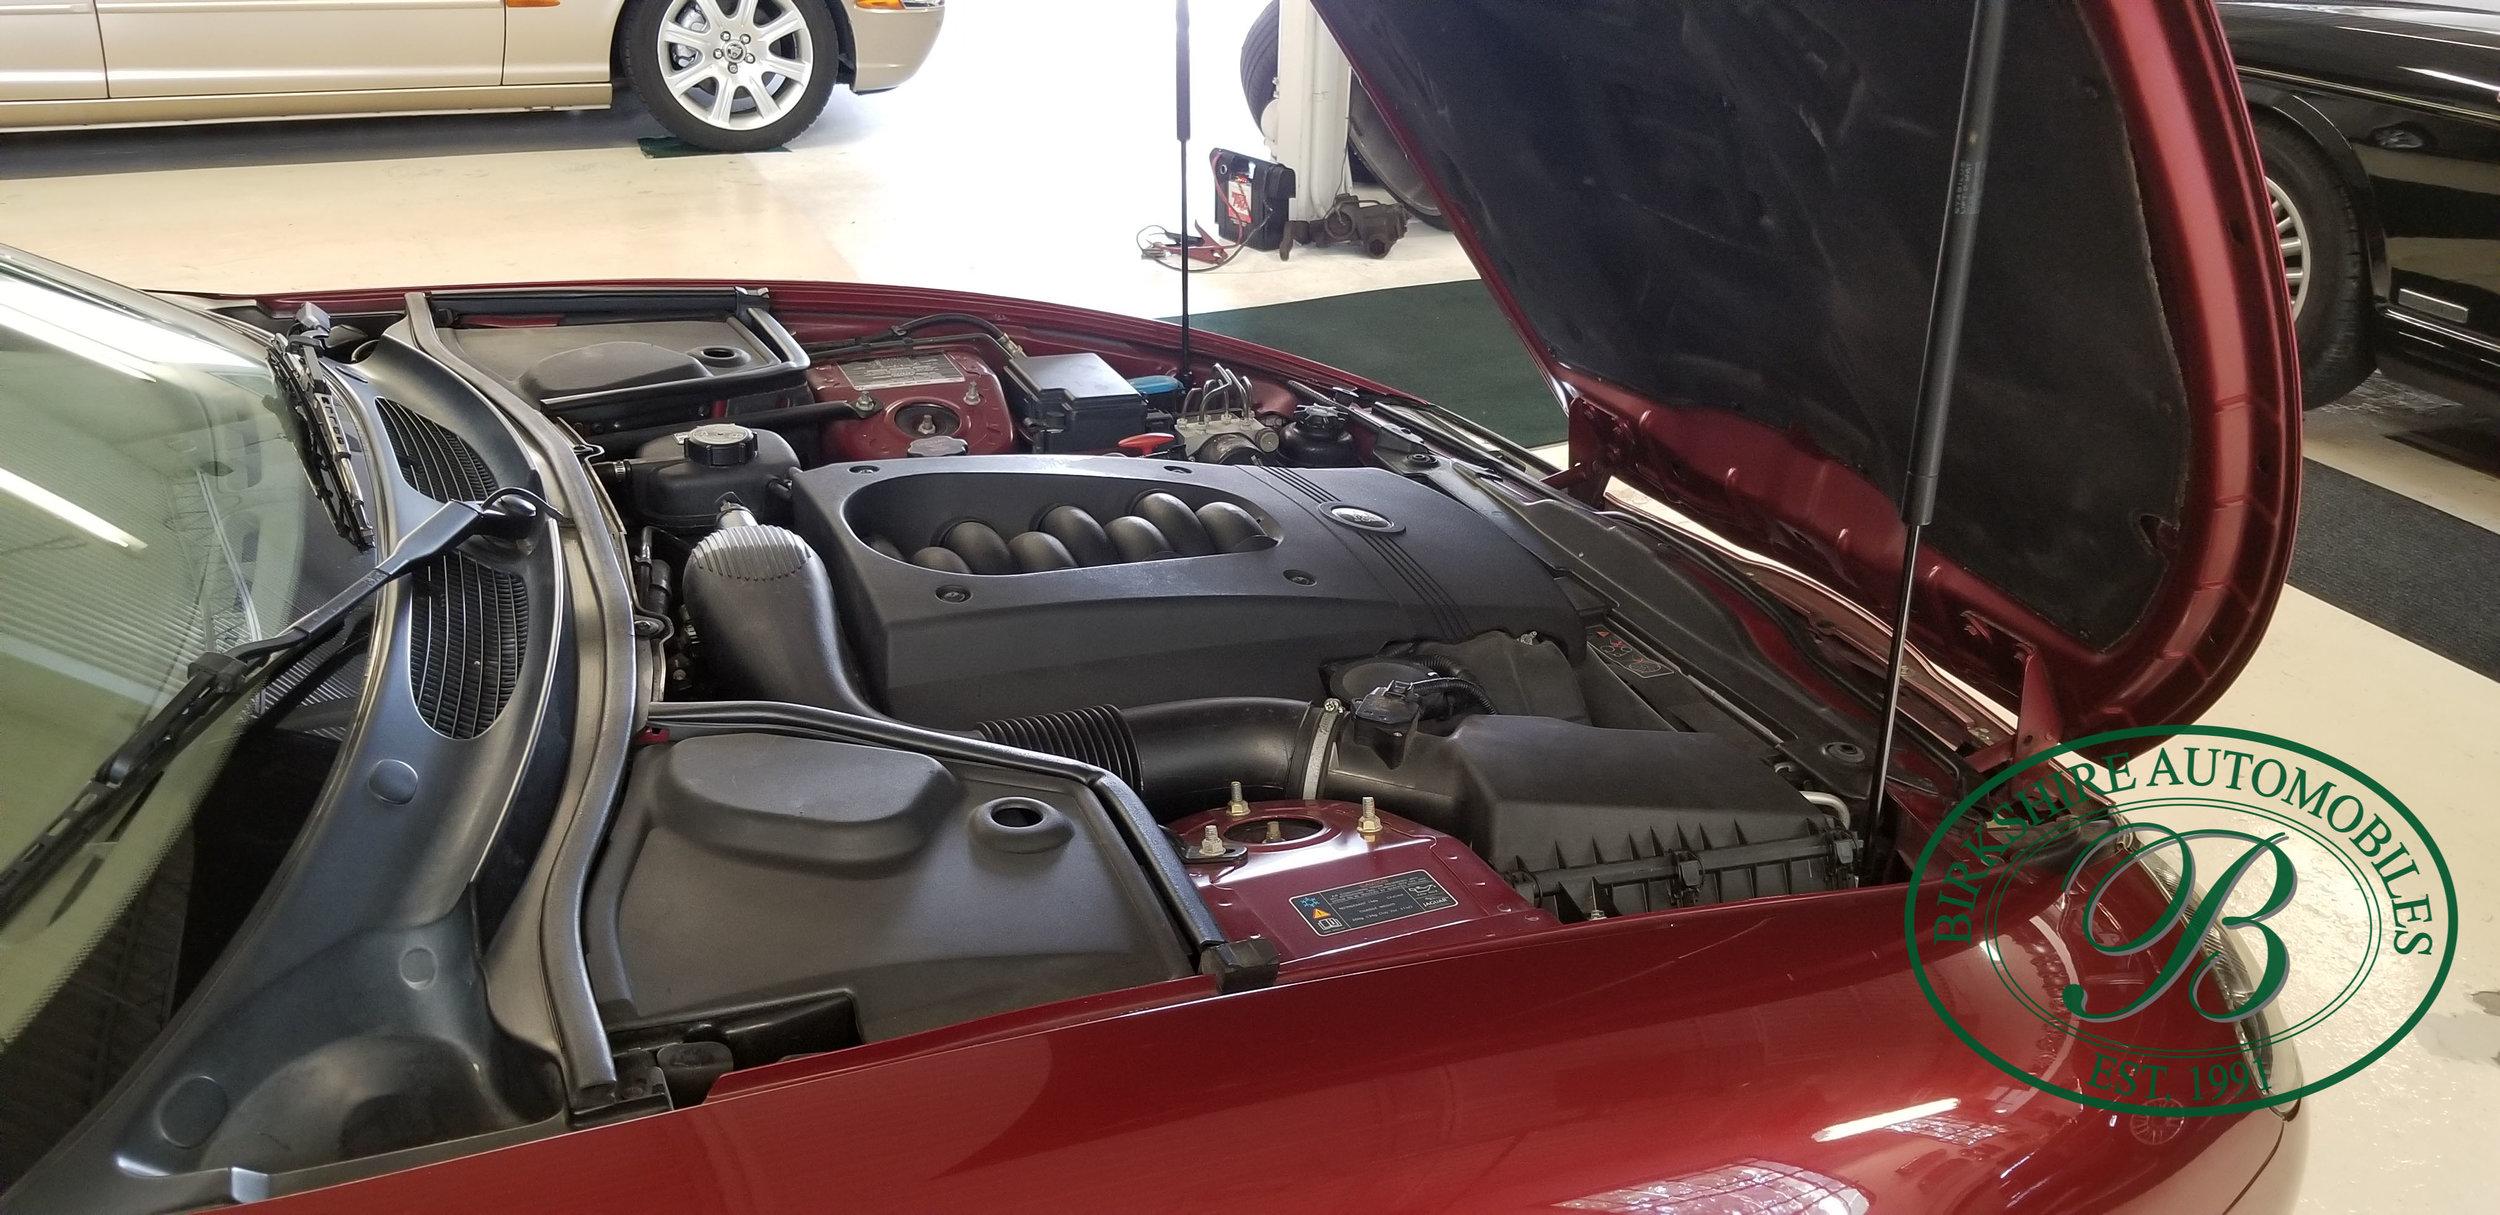 2006 Jaguar XK8 Convertible - Birkshire Automobiles Thornhill (19).jpg